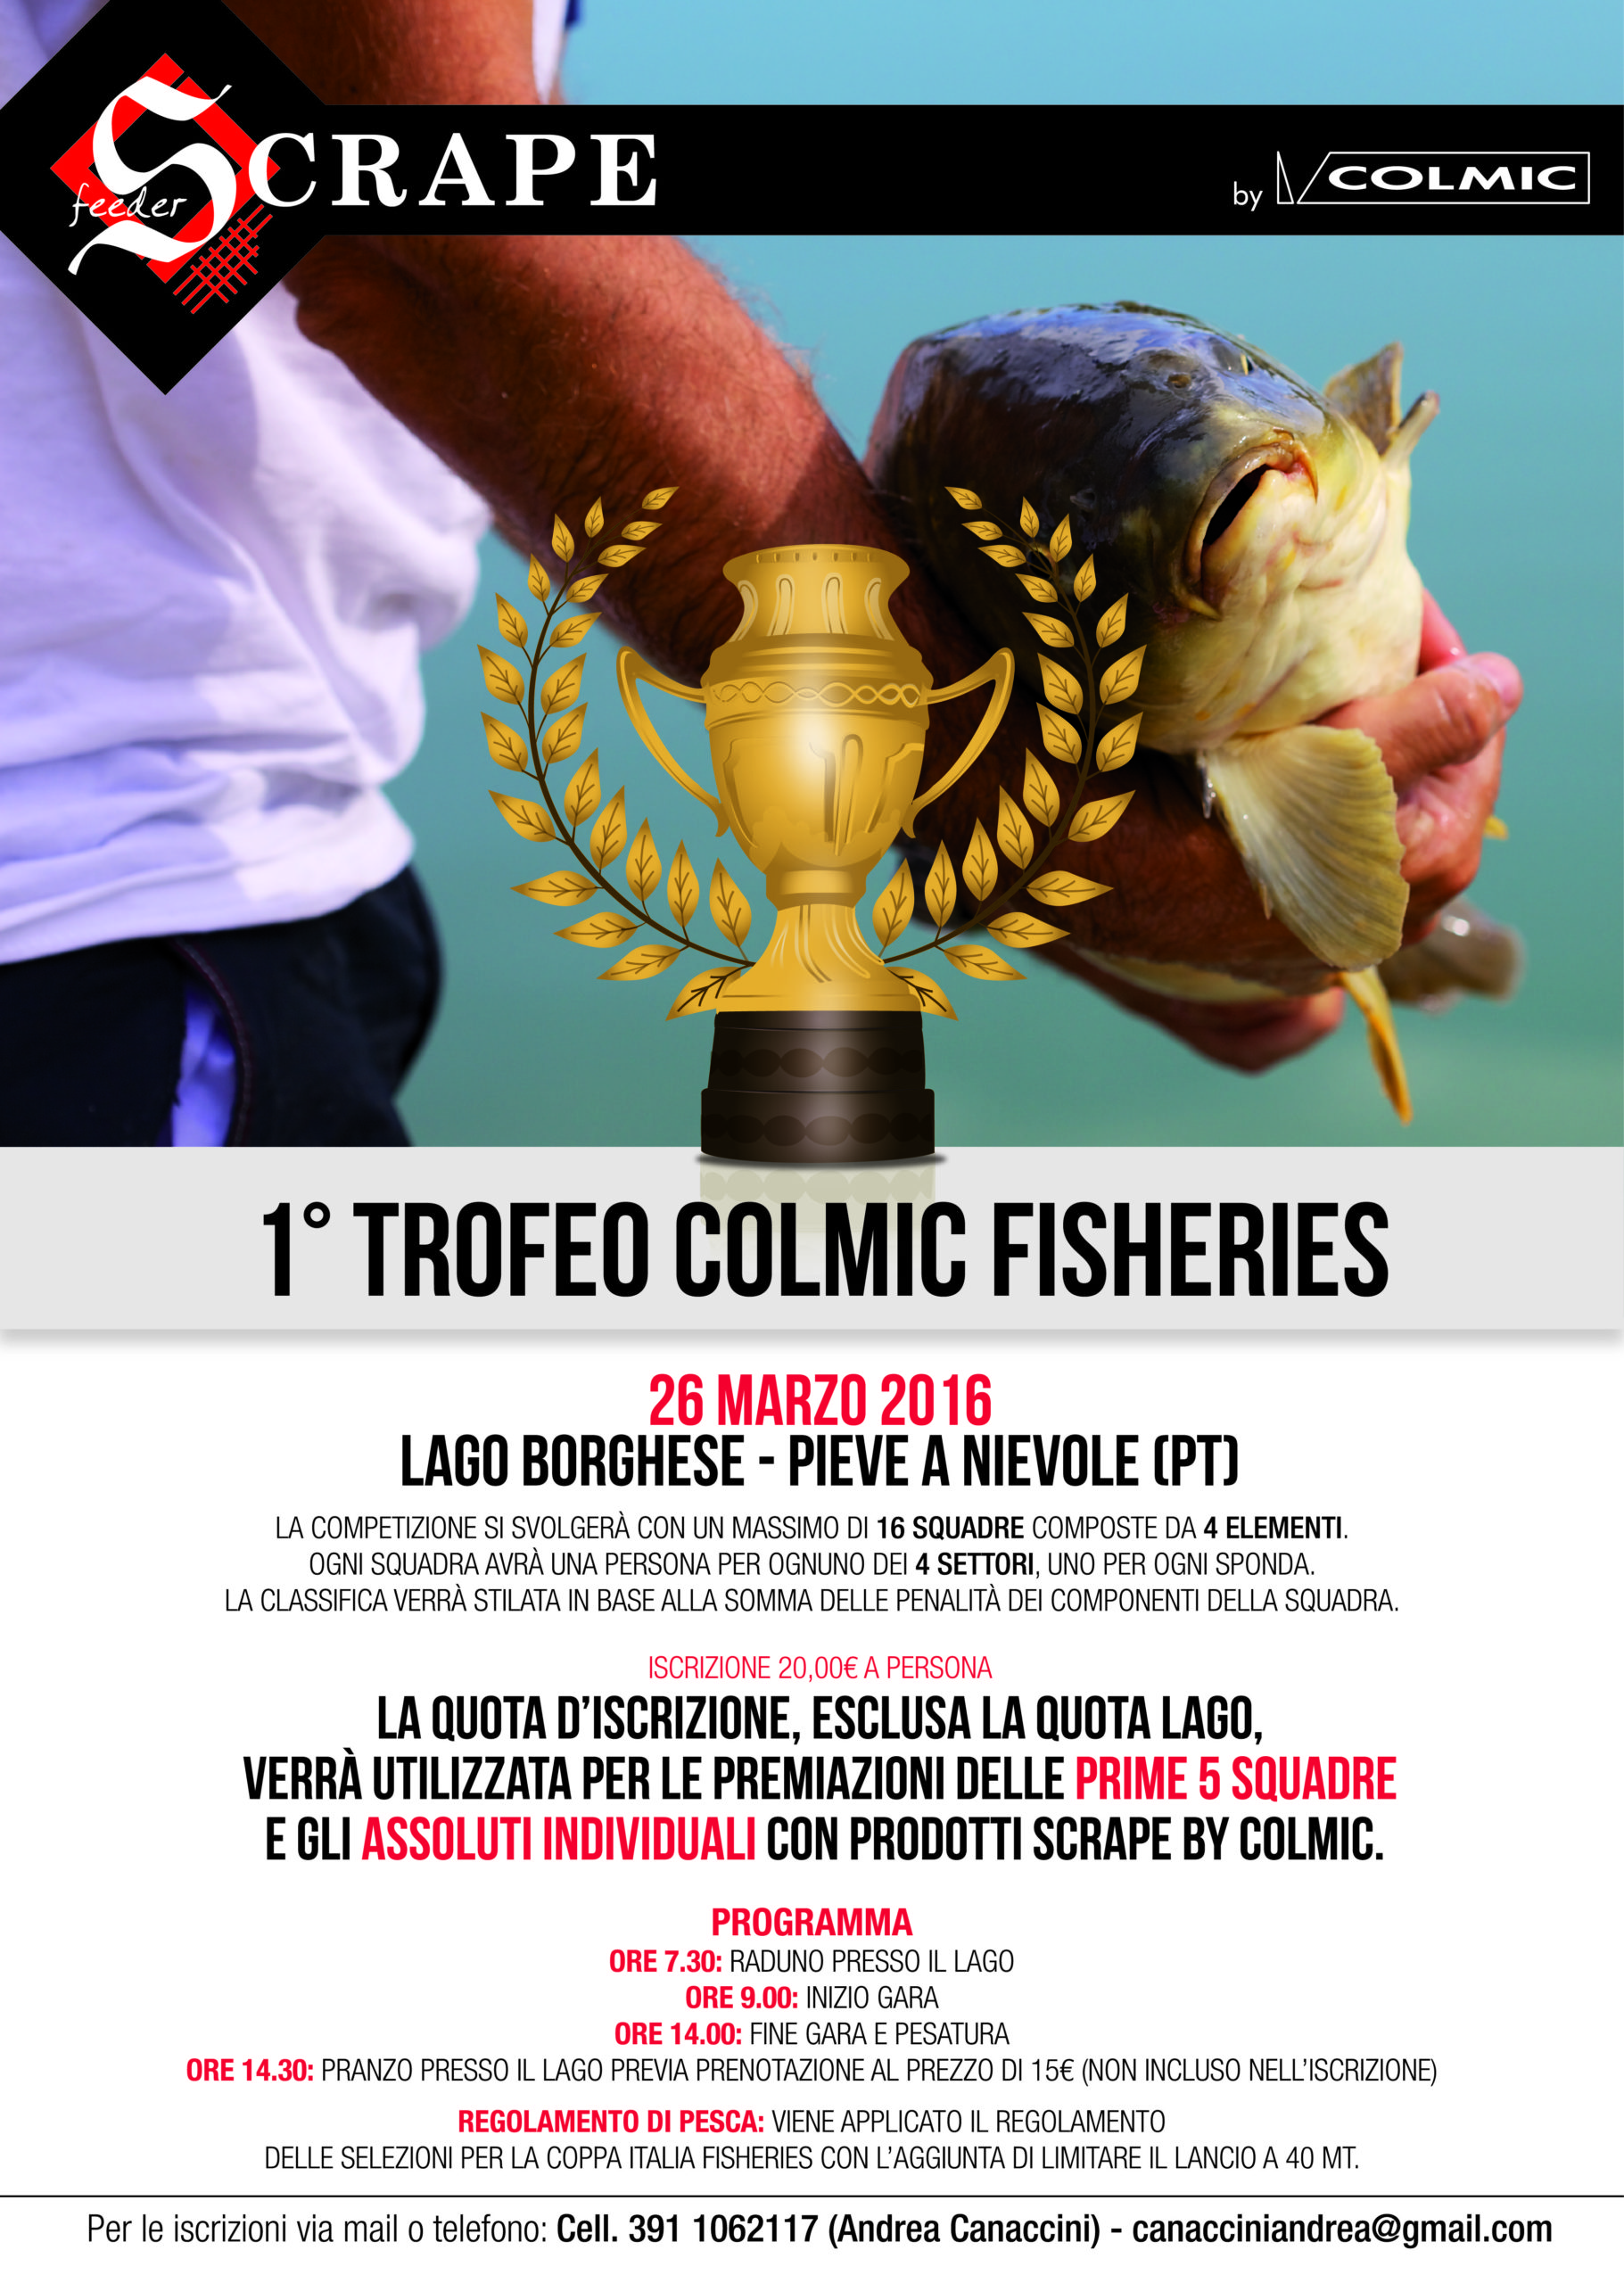 SCRAPE_trofeo_colmic_fisheries-01